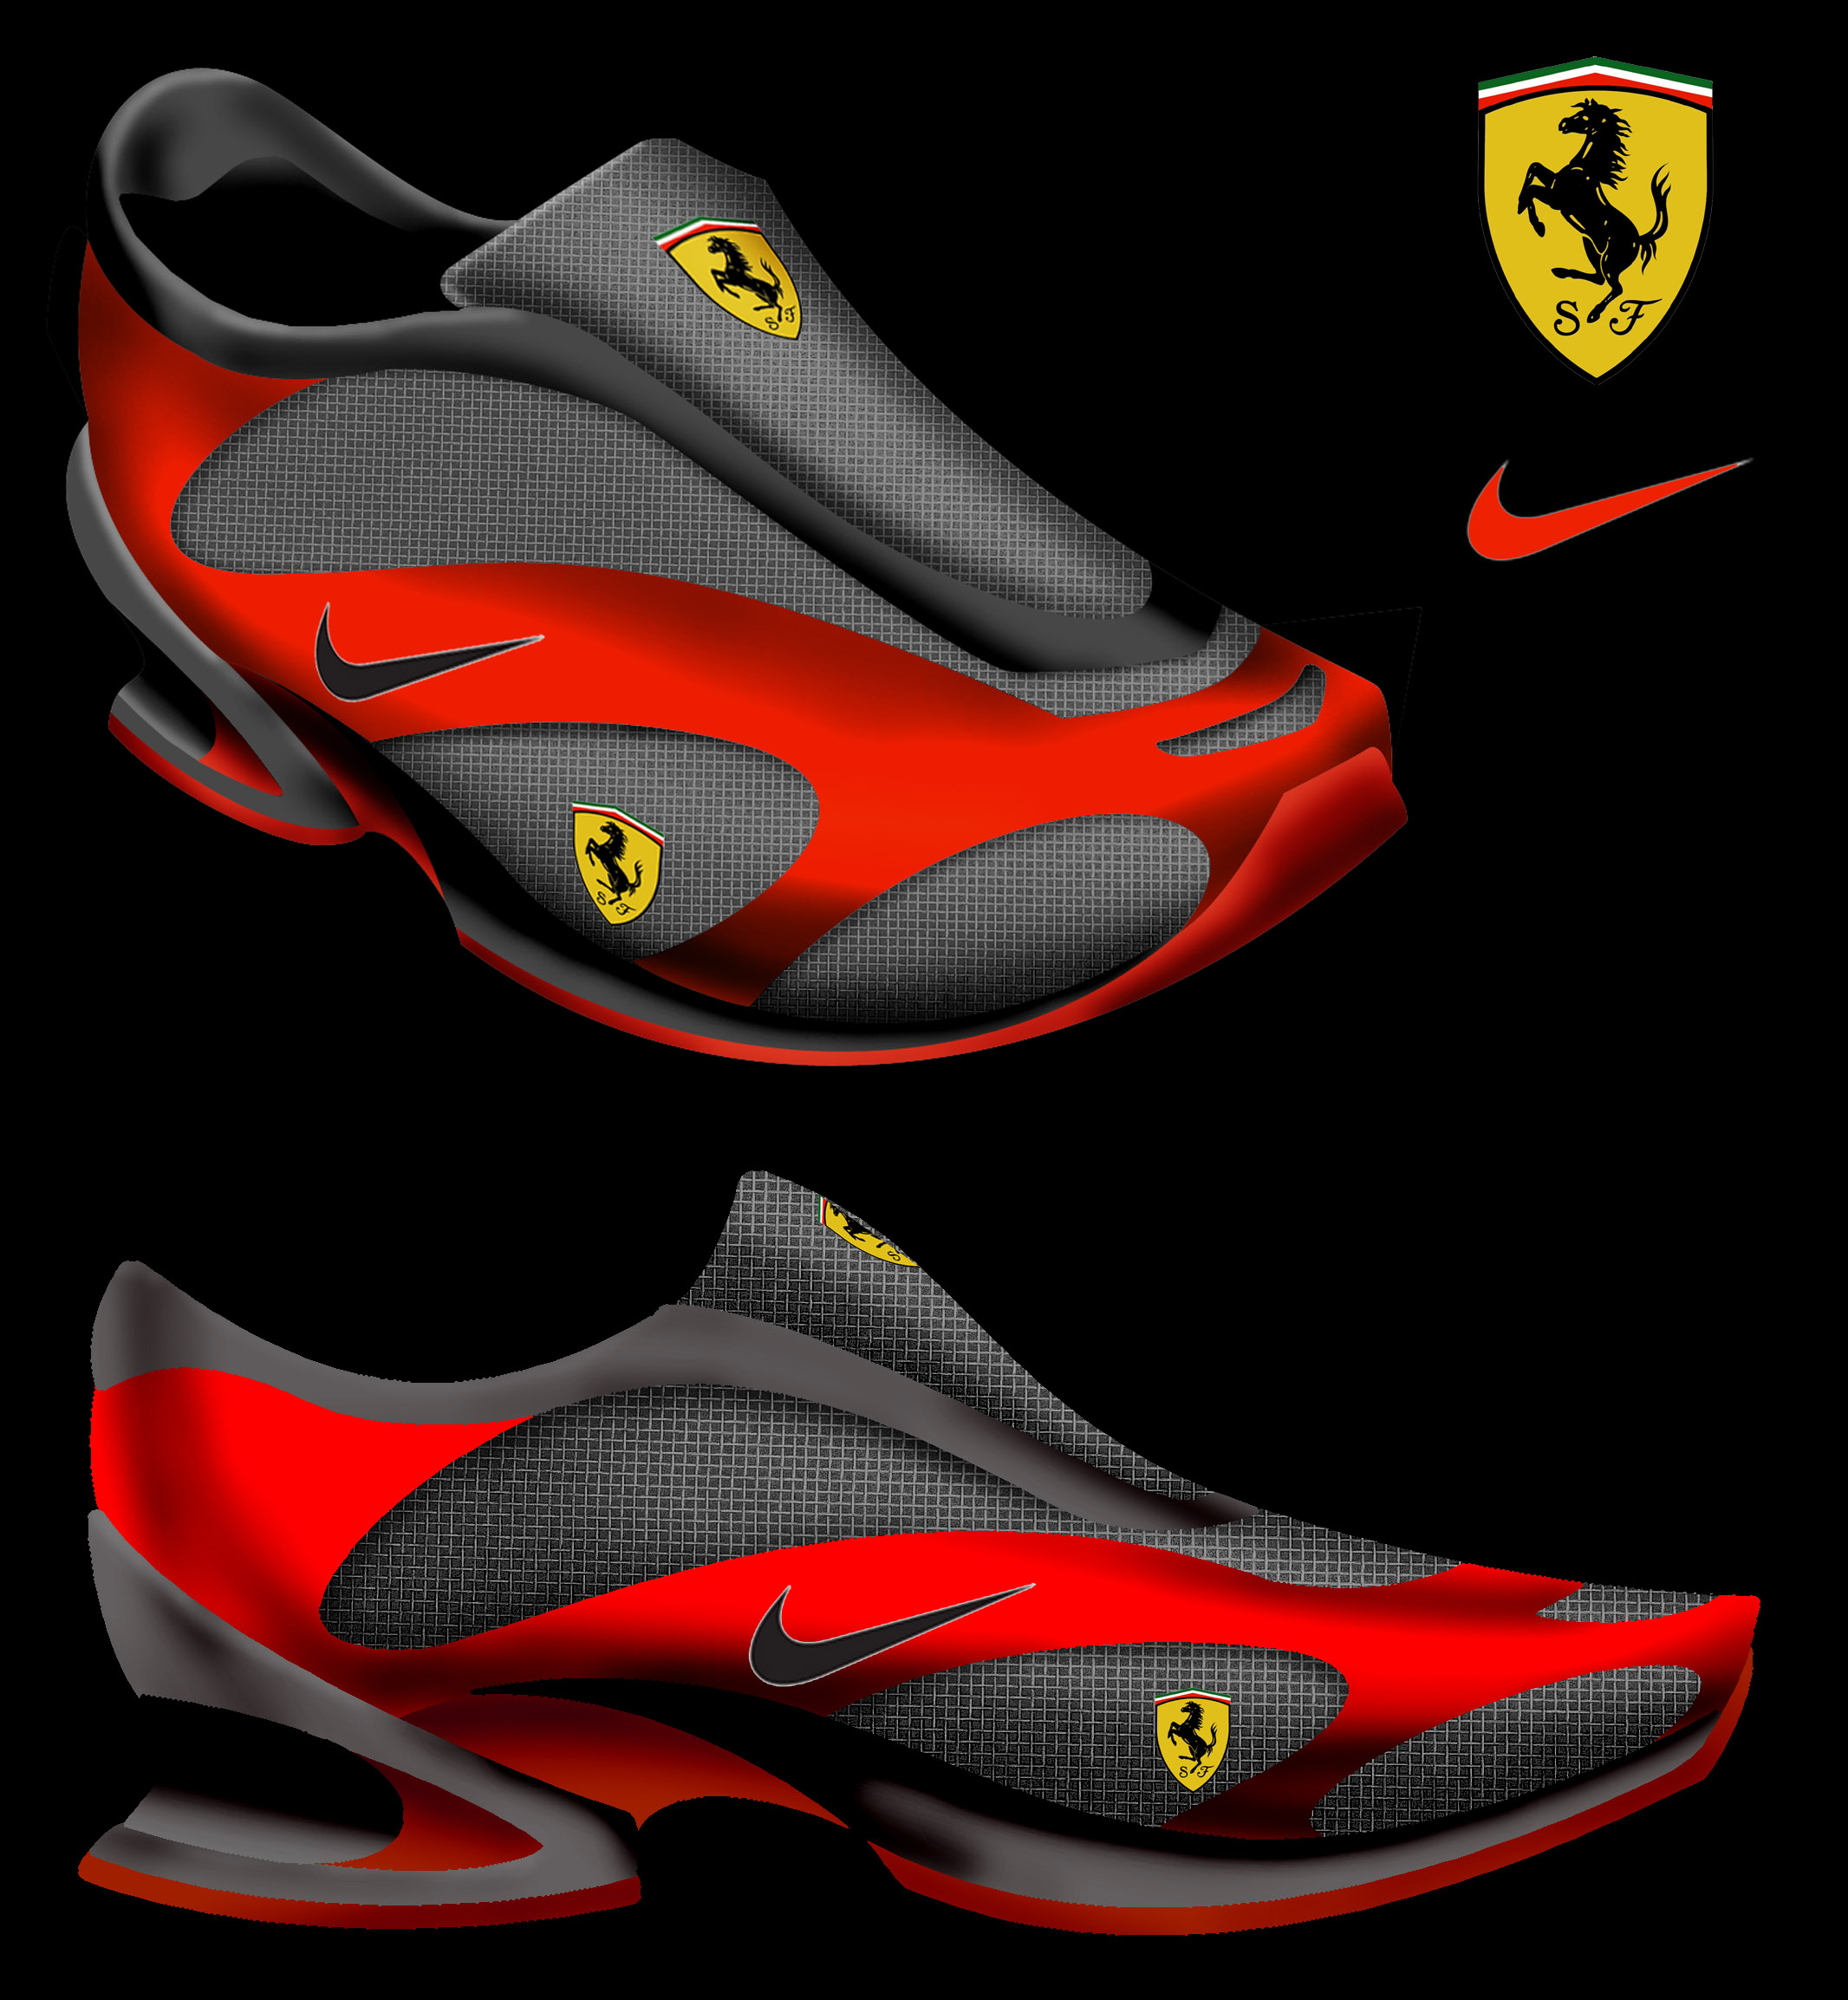 Ferrari Shoes Nike